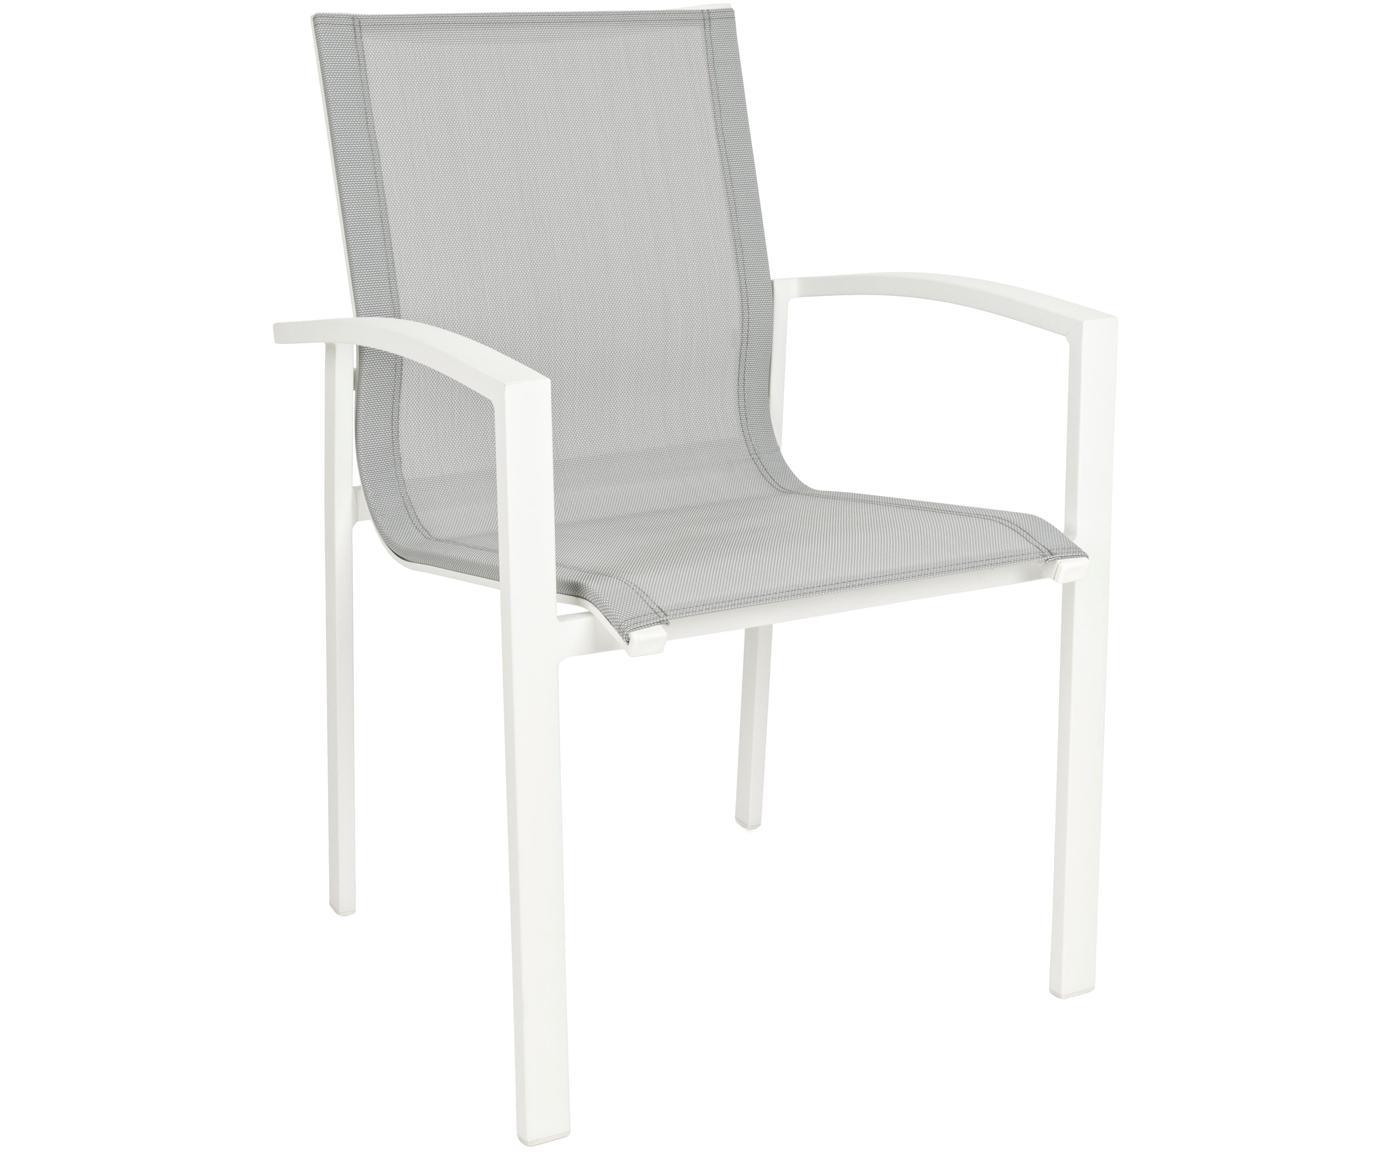 Tuinstoel Atlantic, Frame: gepoedercoat aluminium, Zitvlak: Textilene, Wit, lichtgrijs, B 60 x D 66 cm